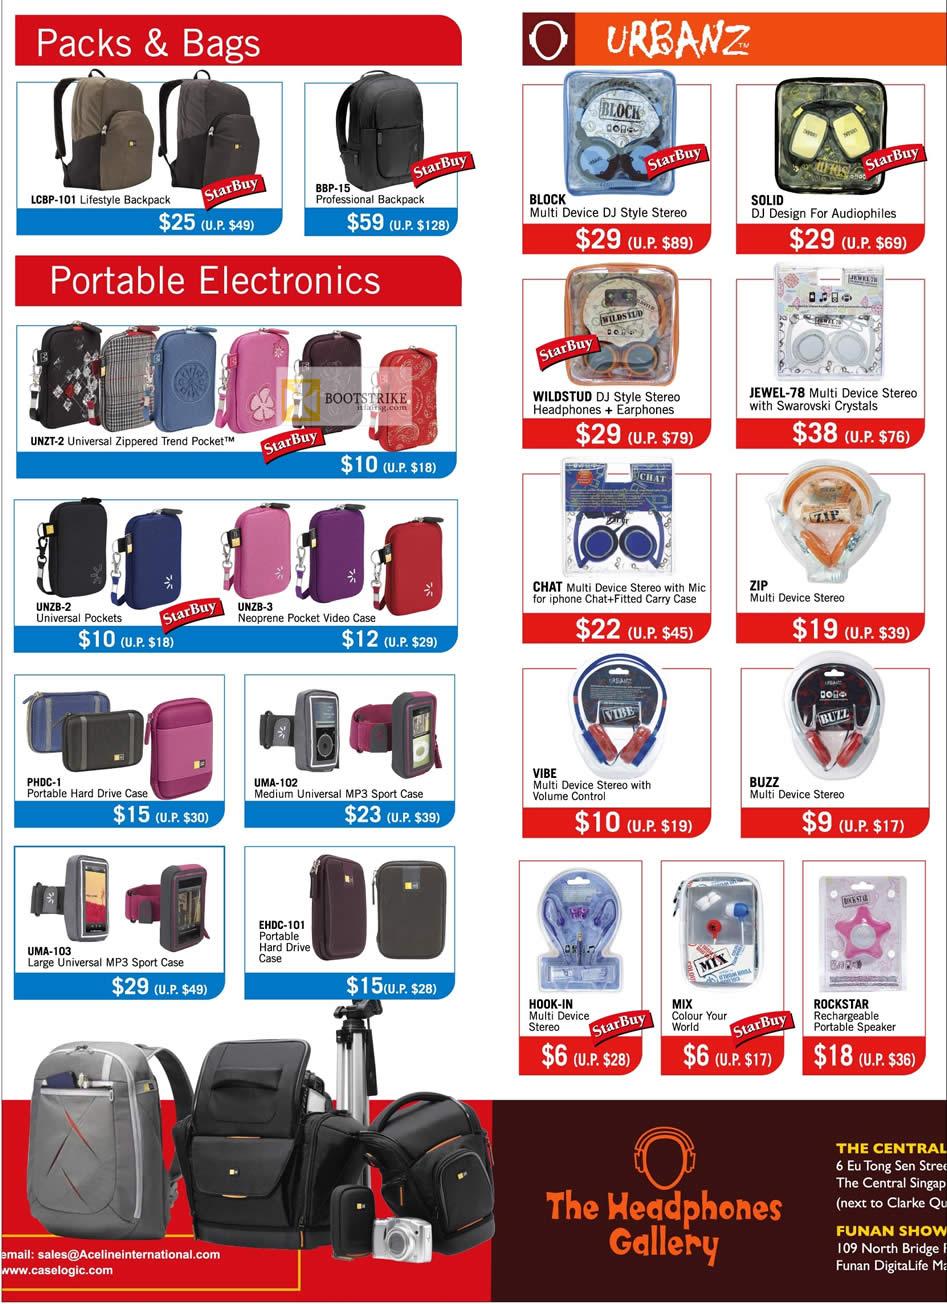 IT SHOW 2012 price list image brochure of The Headphones Gallery Case Logic Packs, Bags LCBP-101, BBP-15, Urbanz, Headphones, Earphones, Portable Speaker, Case, UNZT-2 Universal Zippered Trend Pocket